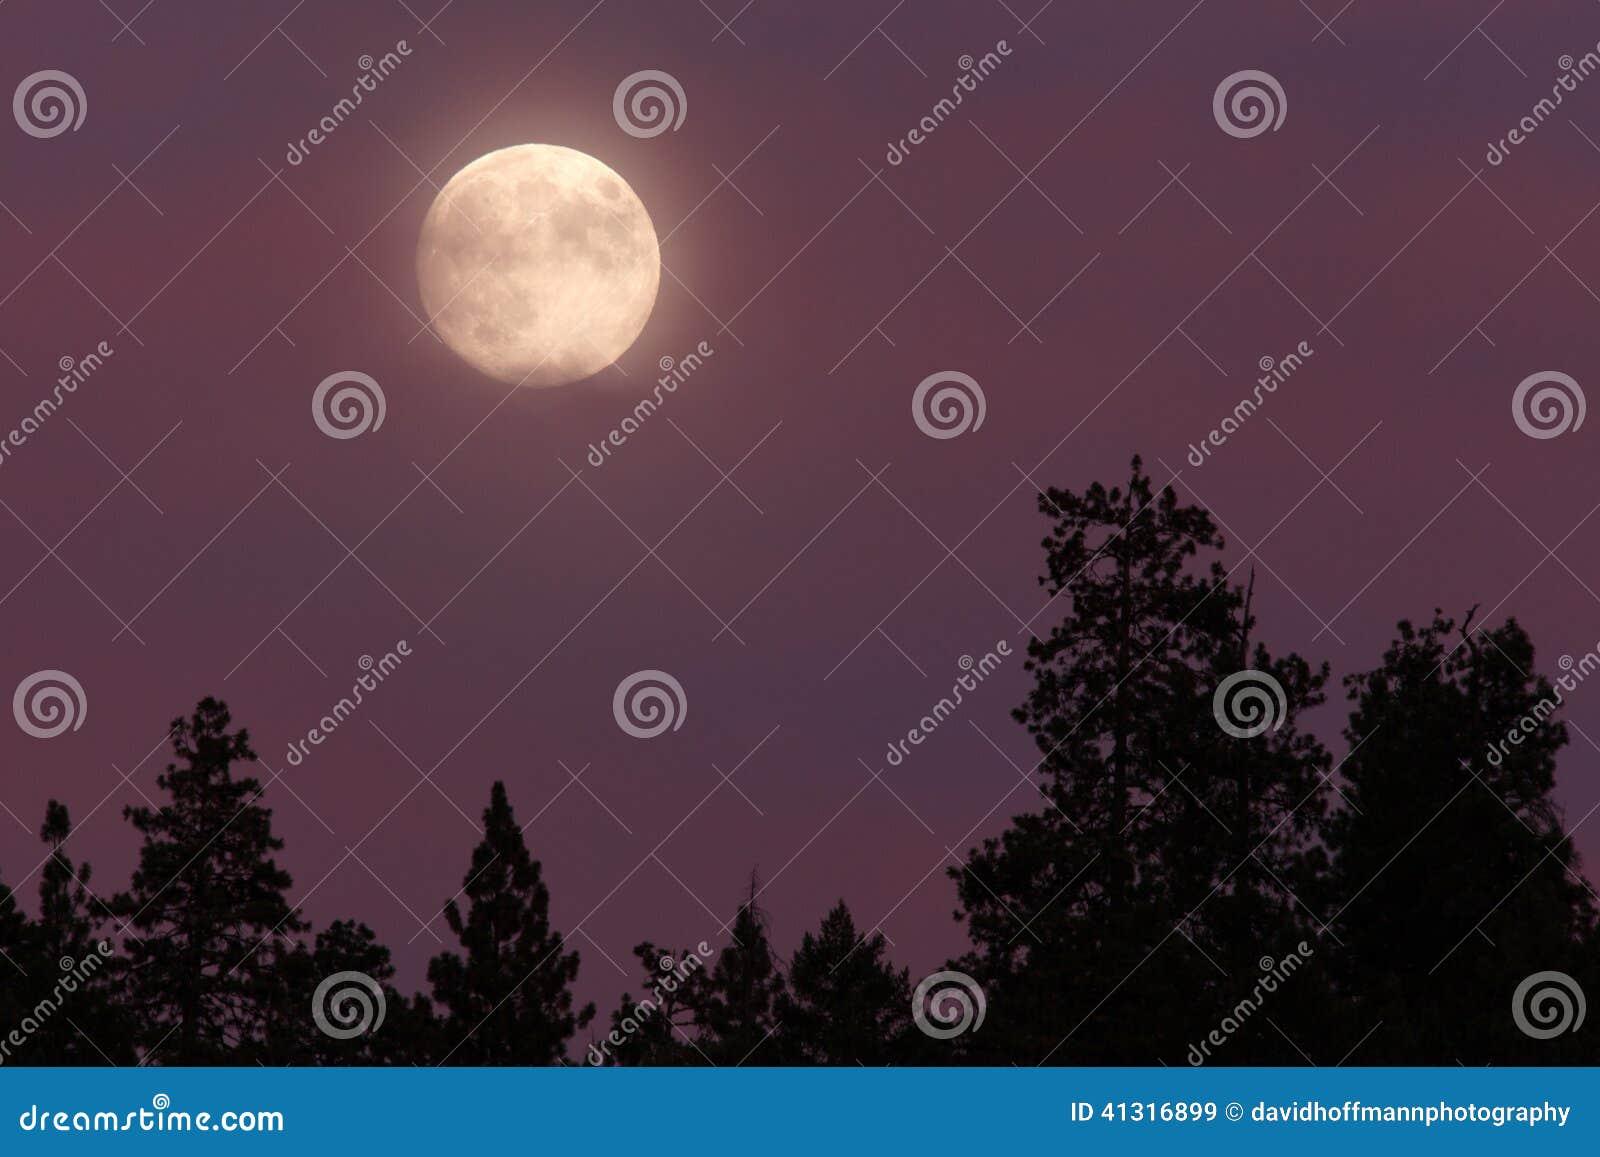 Blue Moon. Full moon 08/19/13, Oregon, Cascade Siskiyou National